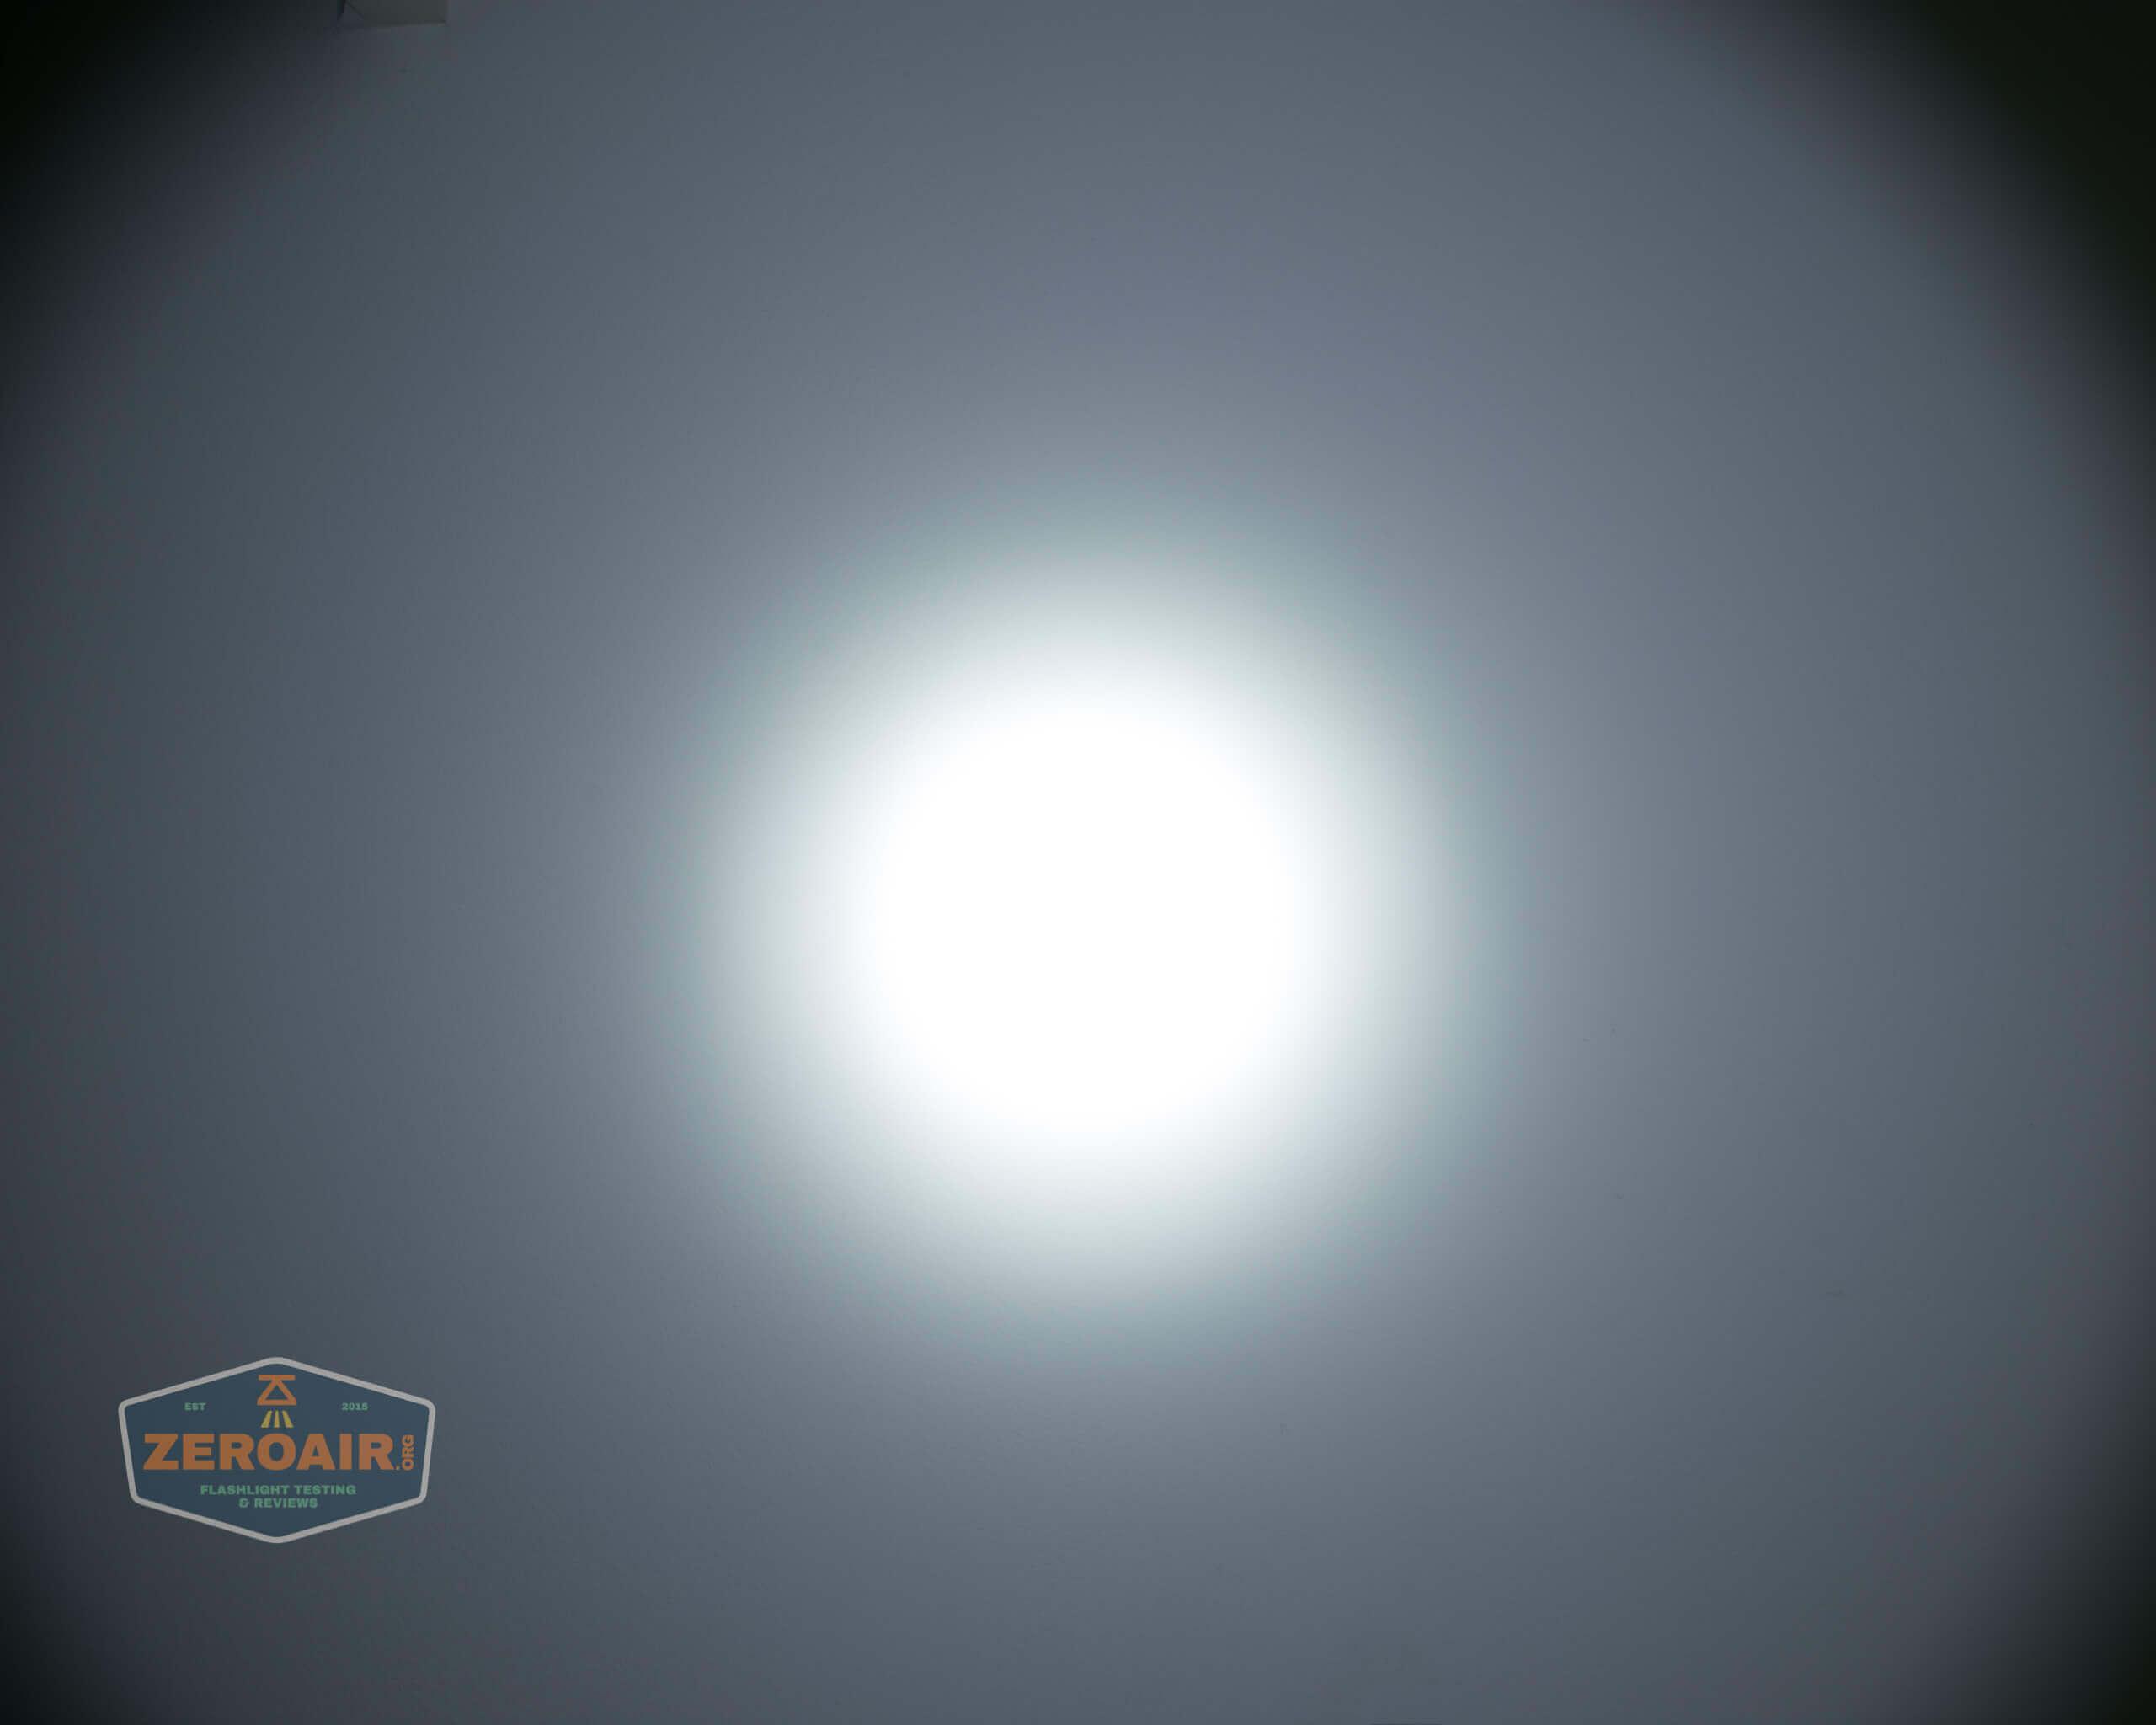 skilhunt m300 18650 flashlight beamshot ceiling 8